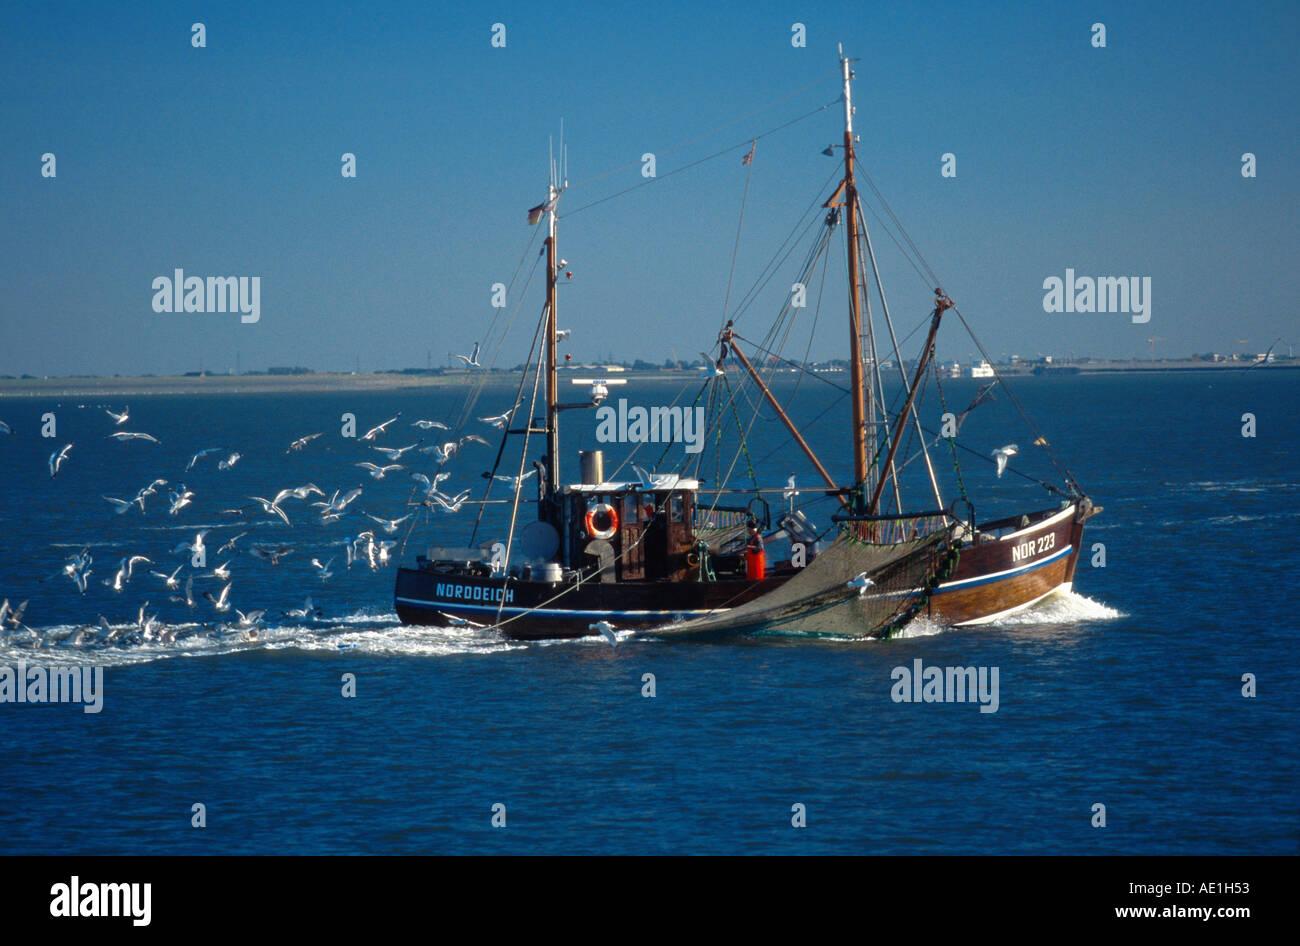 fishing smack on the sea, Germany, North Sea - Stock Image